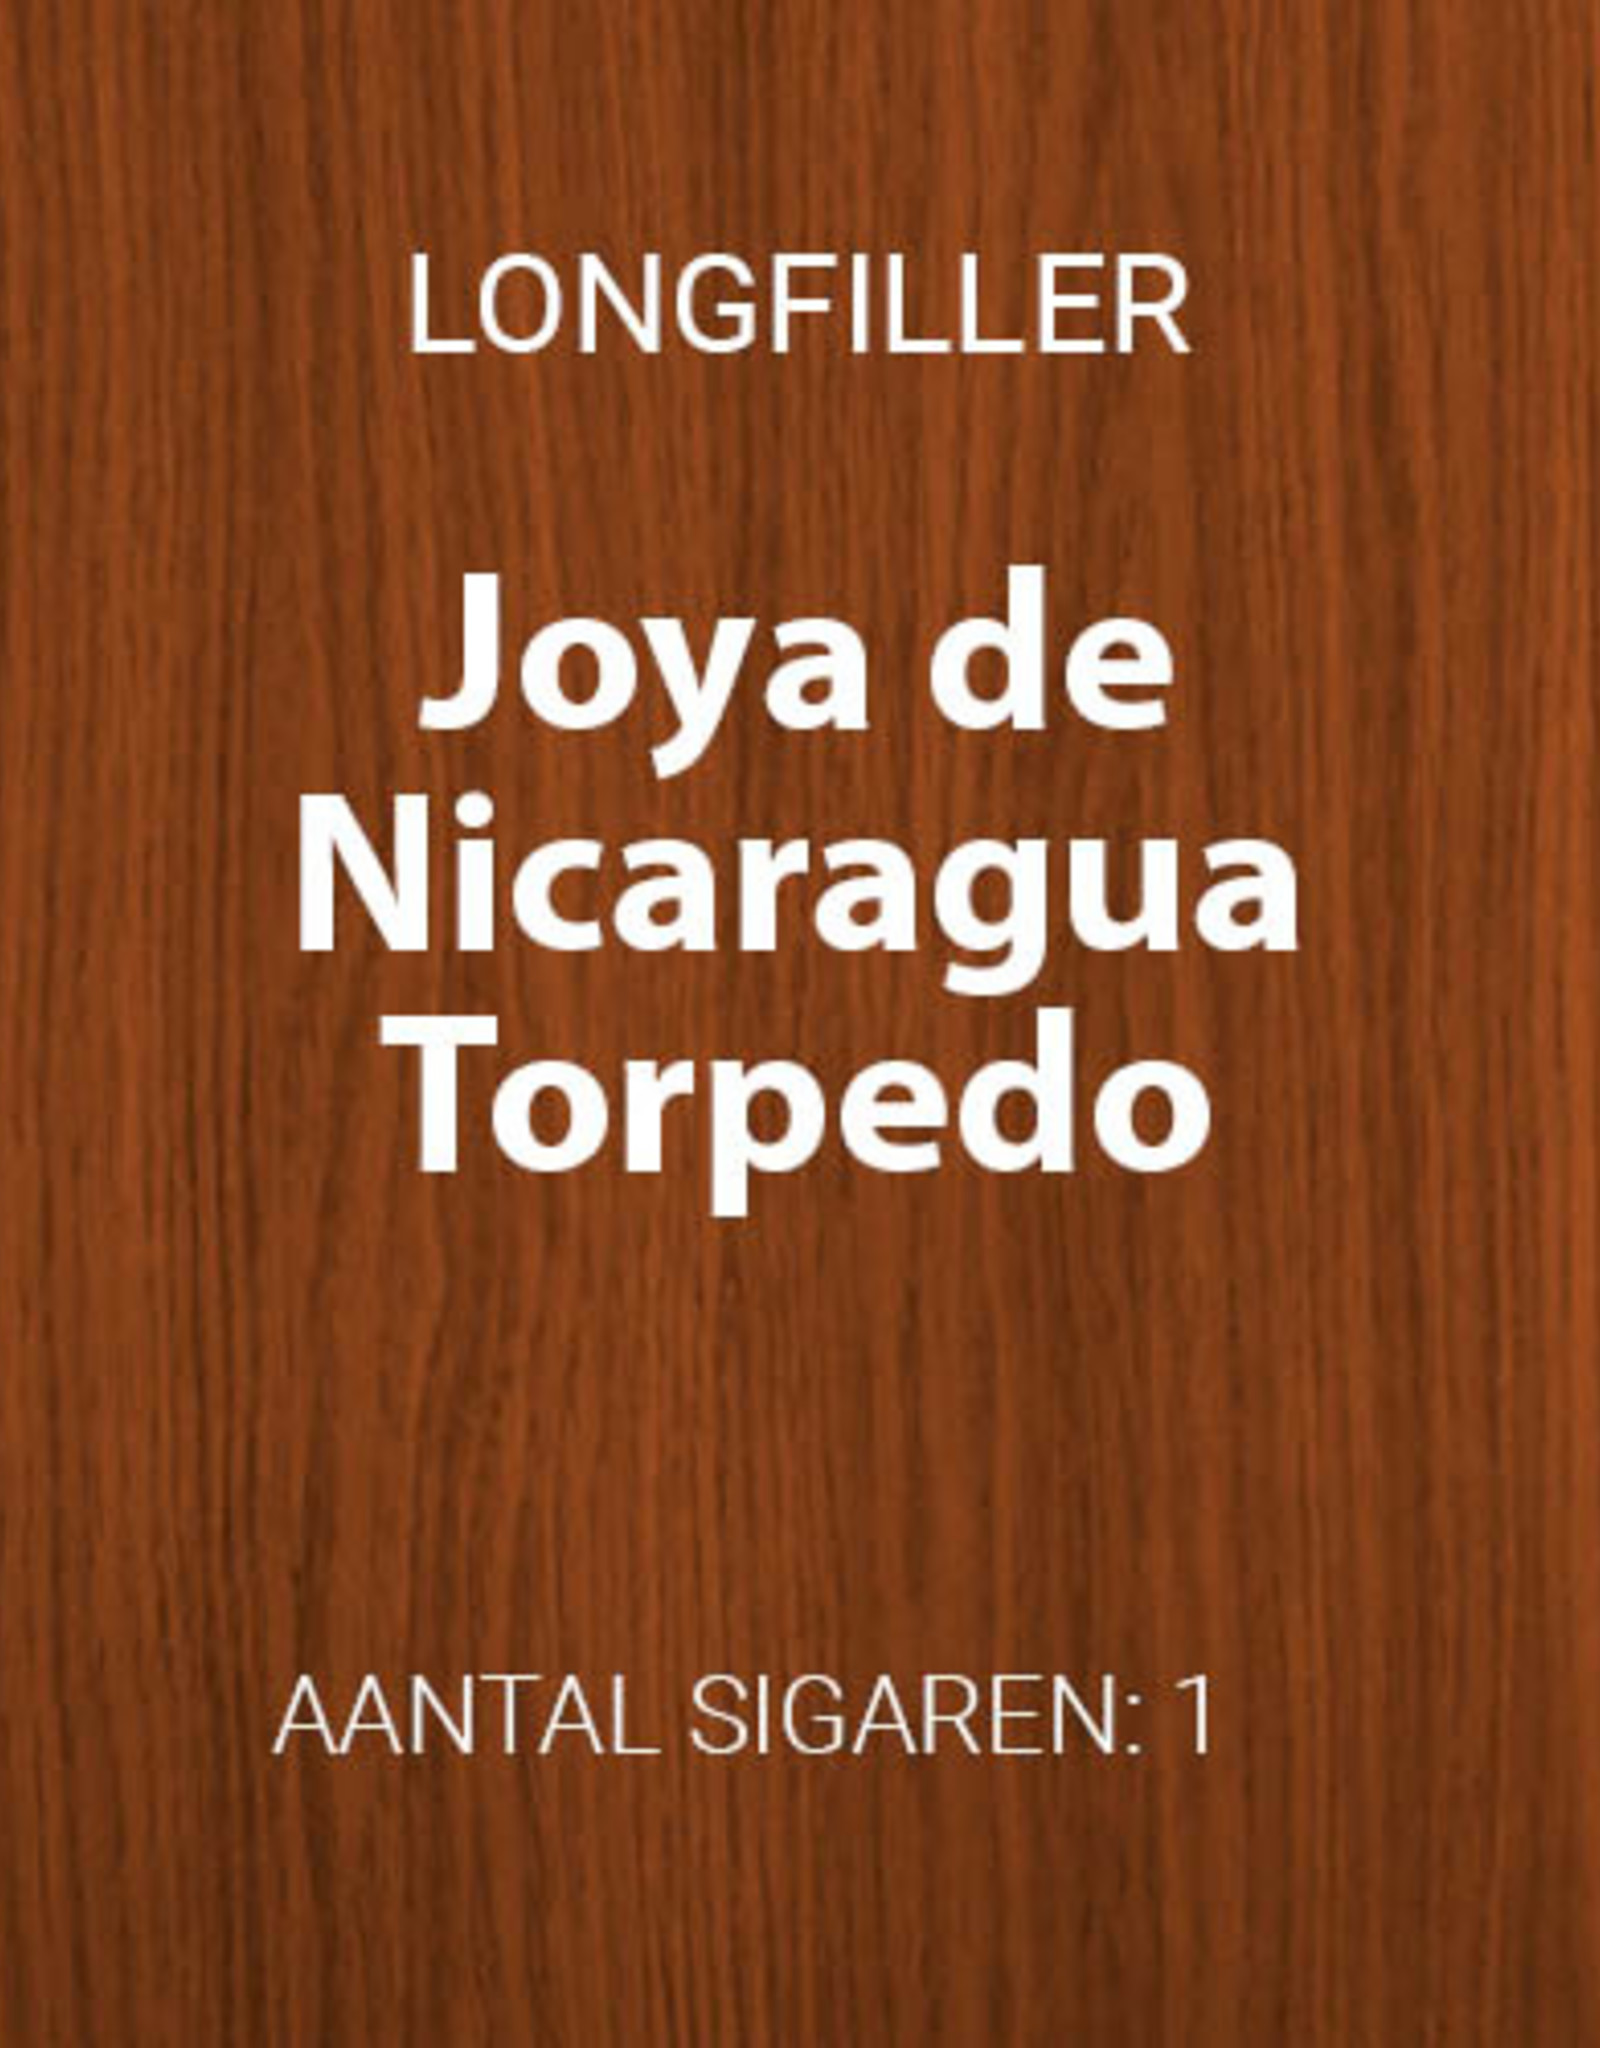 Joya de Nicaragua Torpedo longfiller